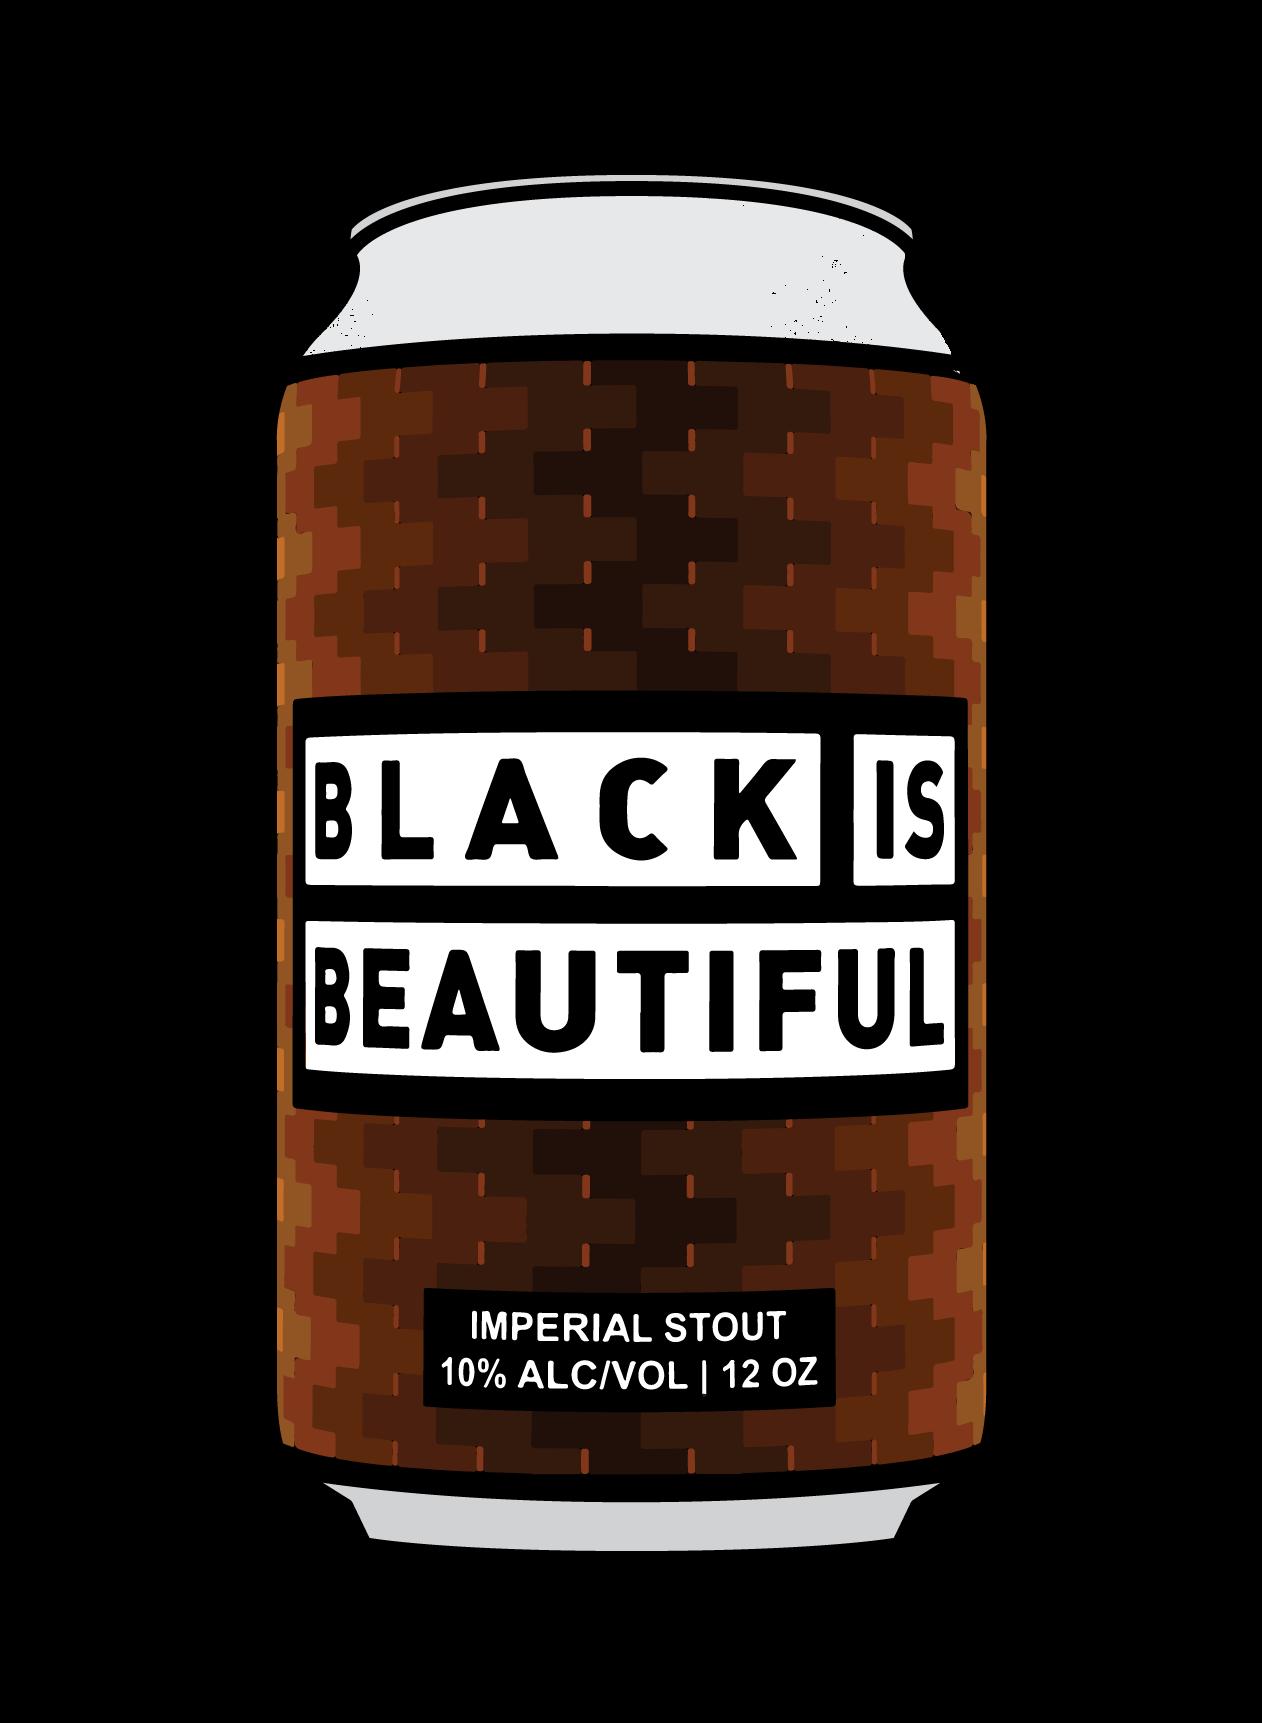 Black is Beautiful Image